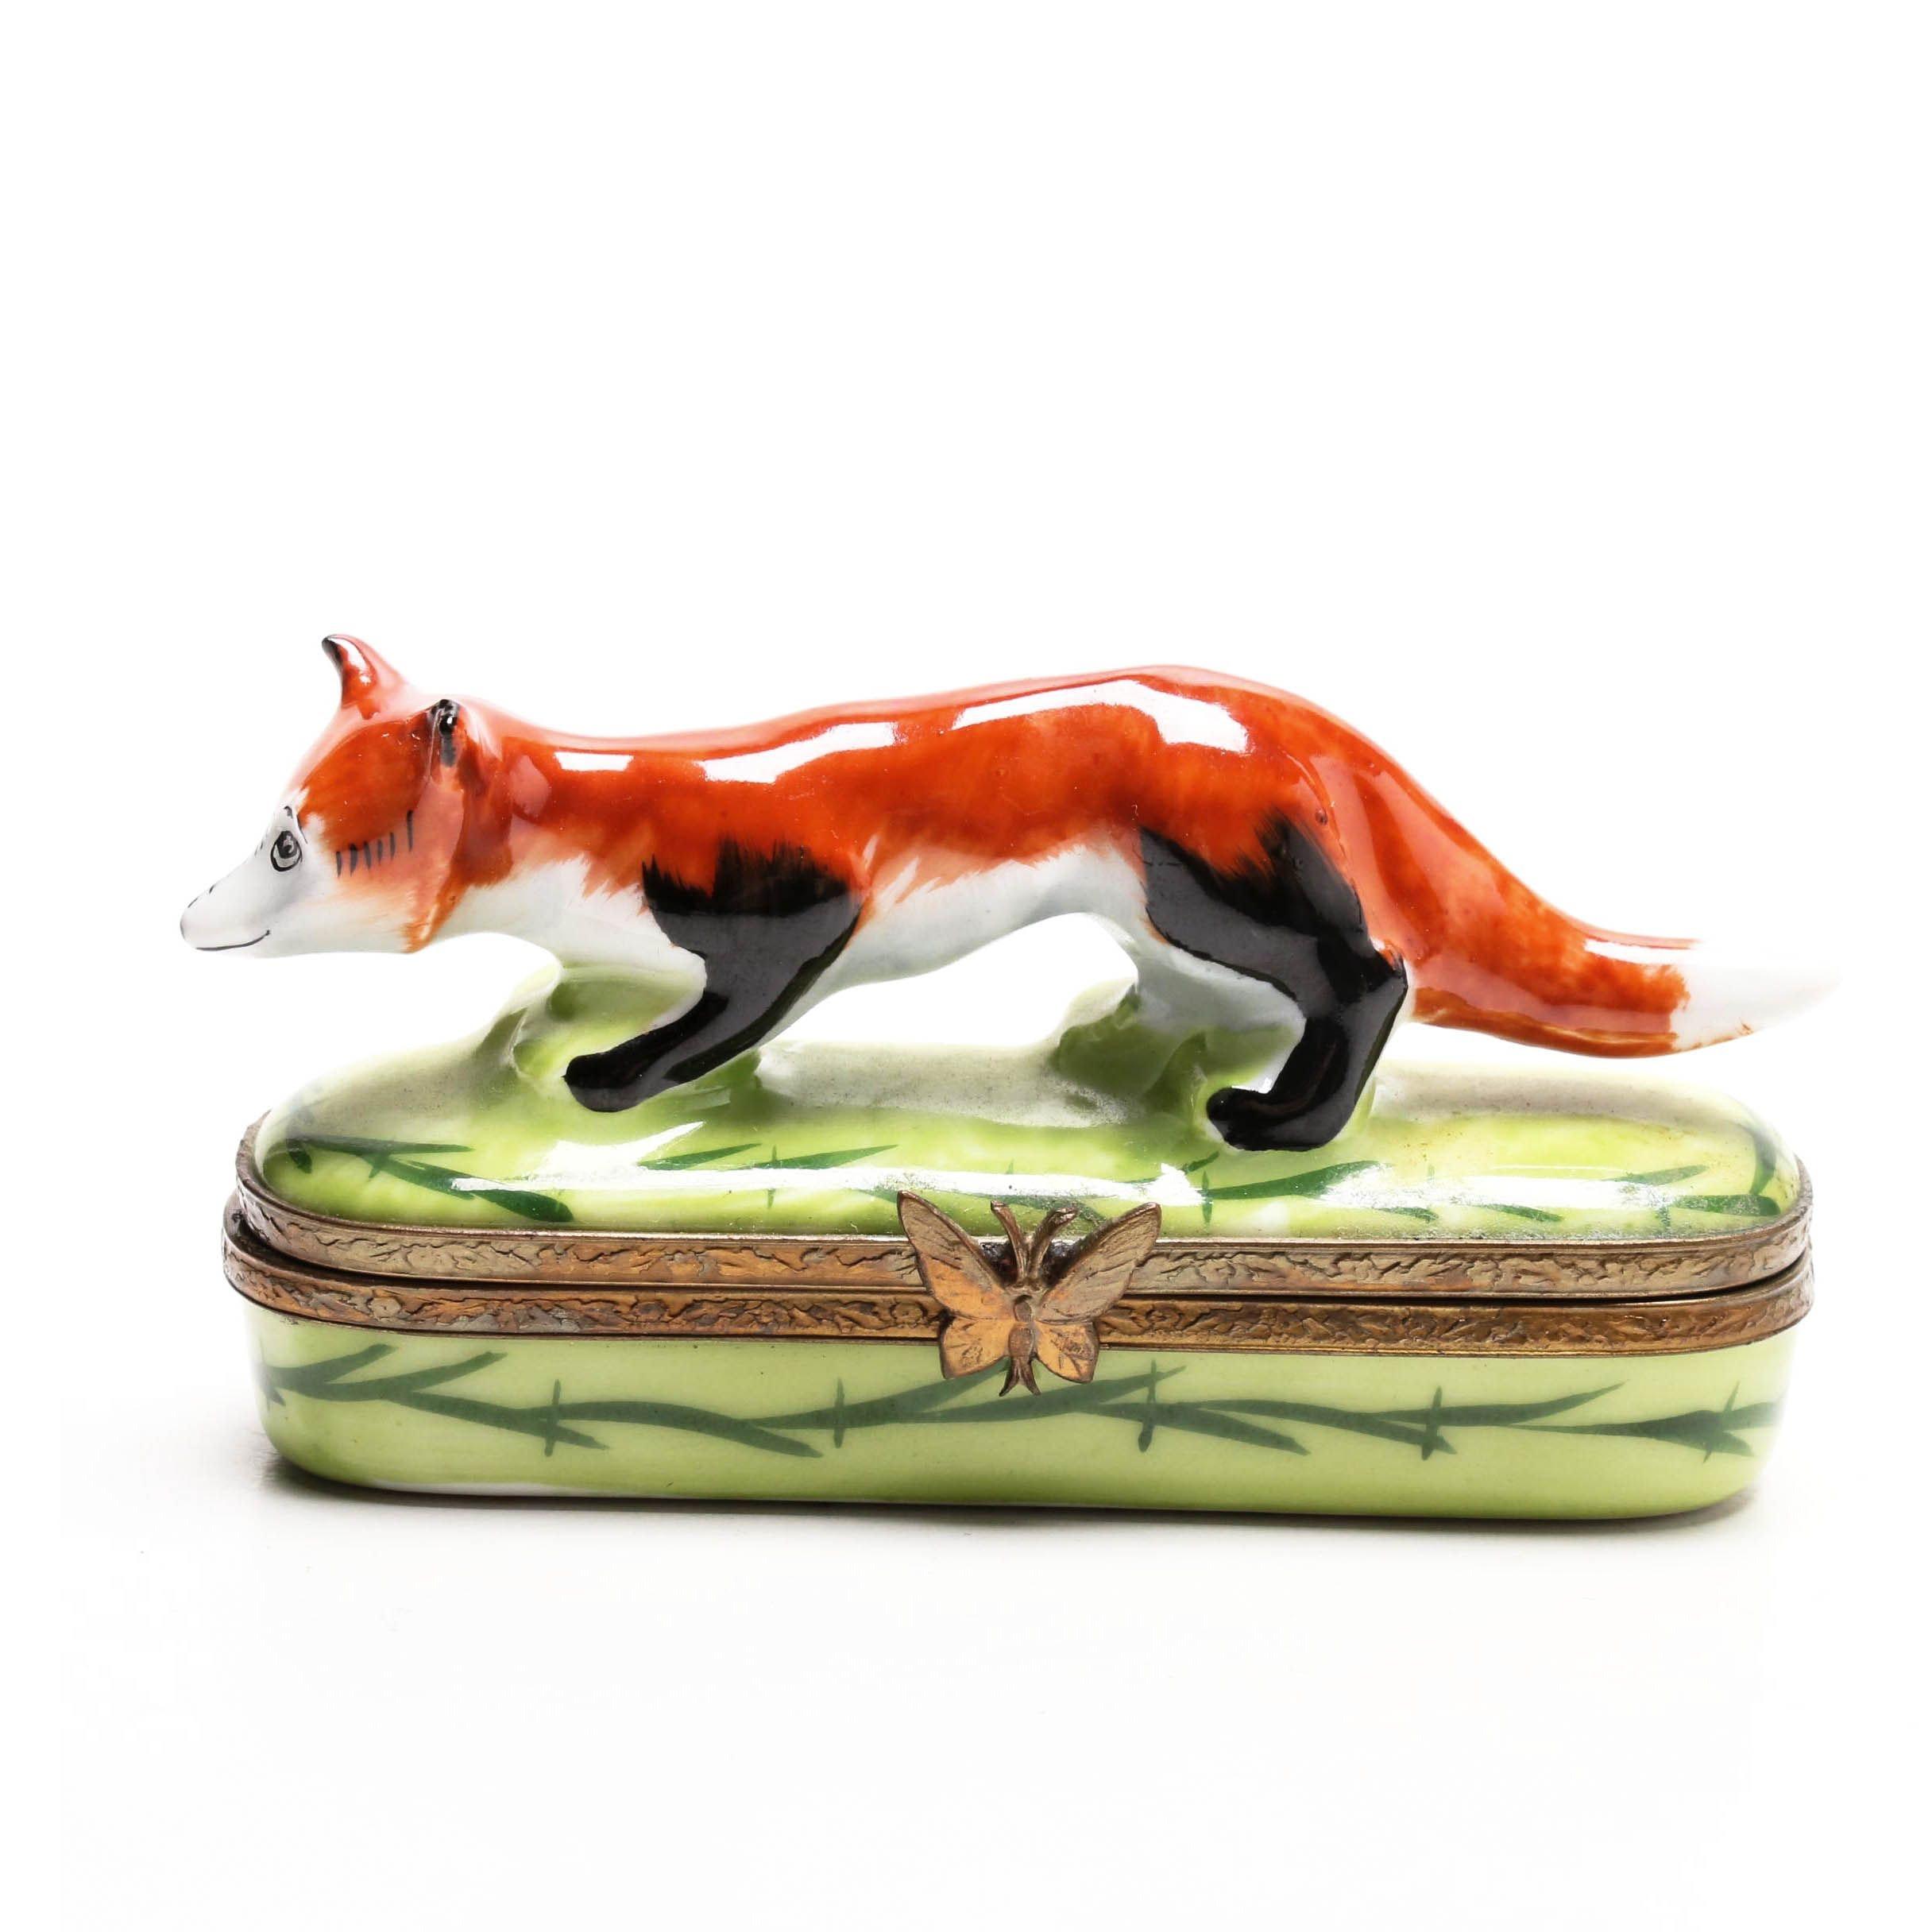 Limoges Hand-Painted Porcelain Figural Fox Trinket Box